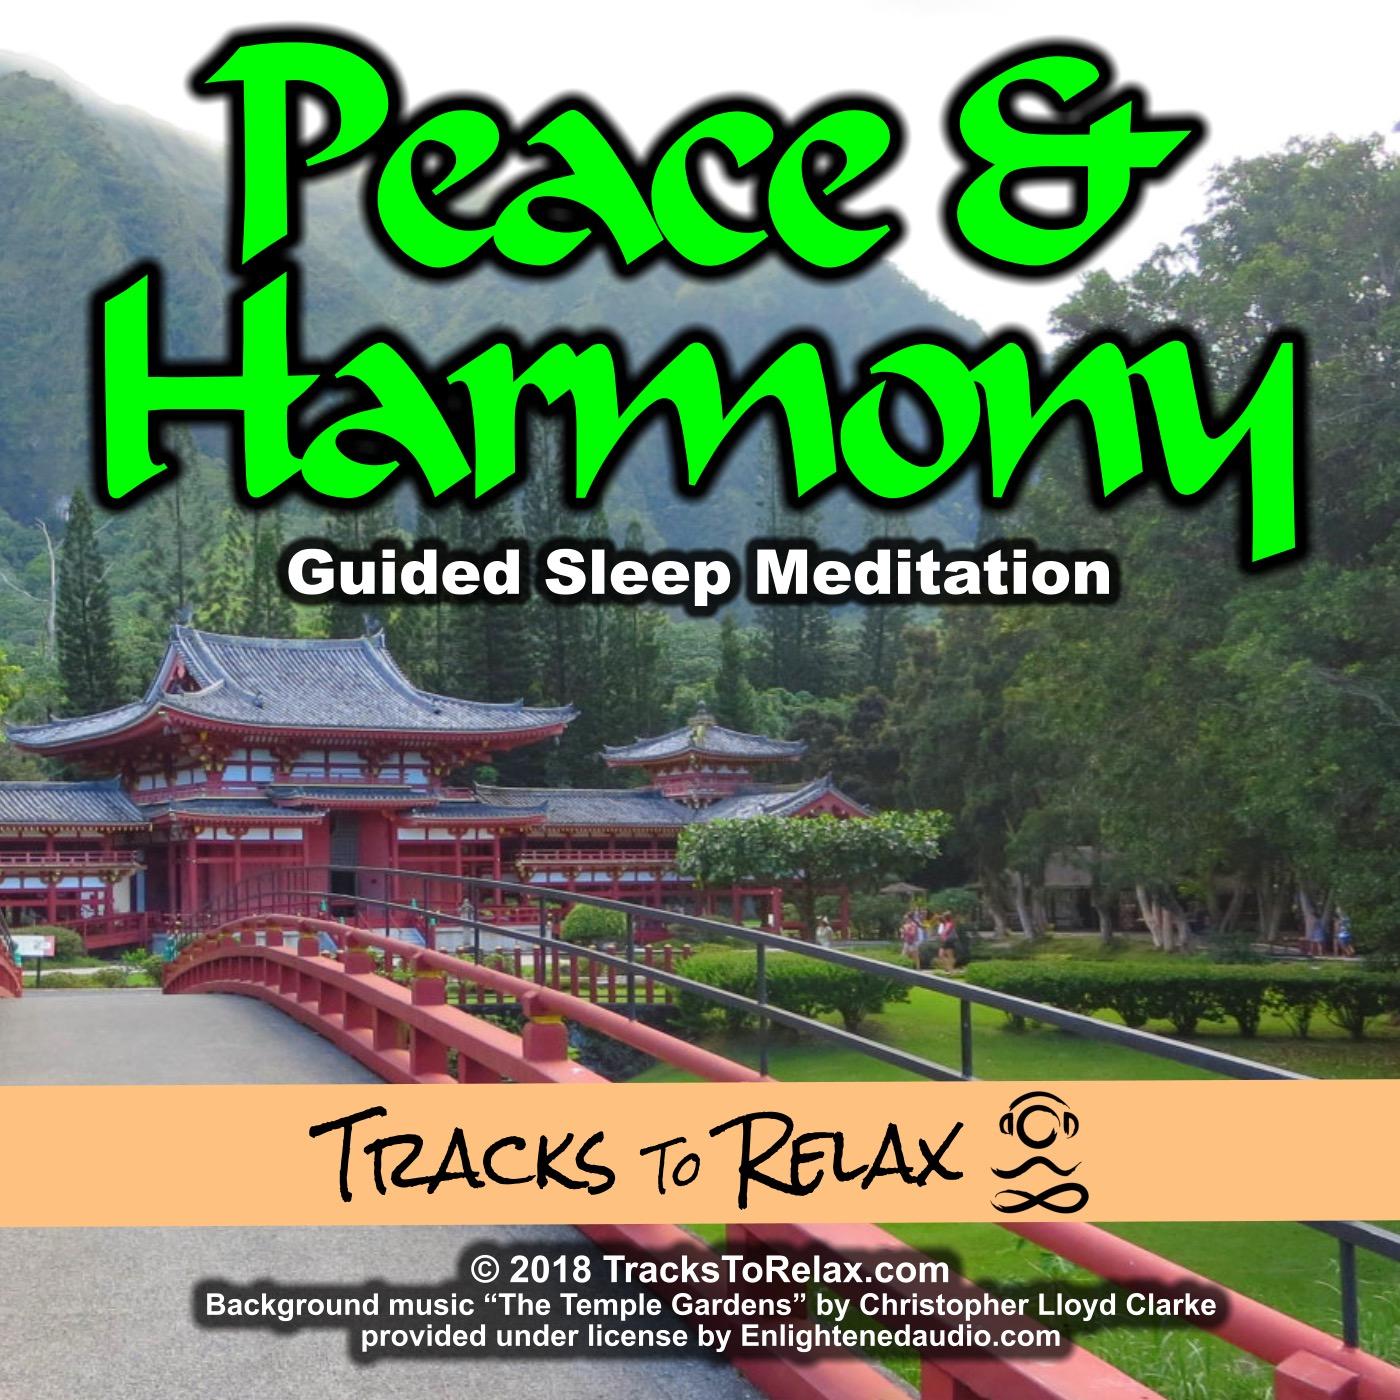 Peace and harmony sleep or nap meditation